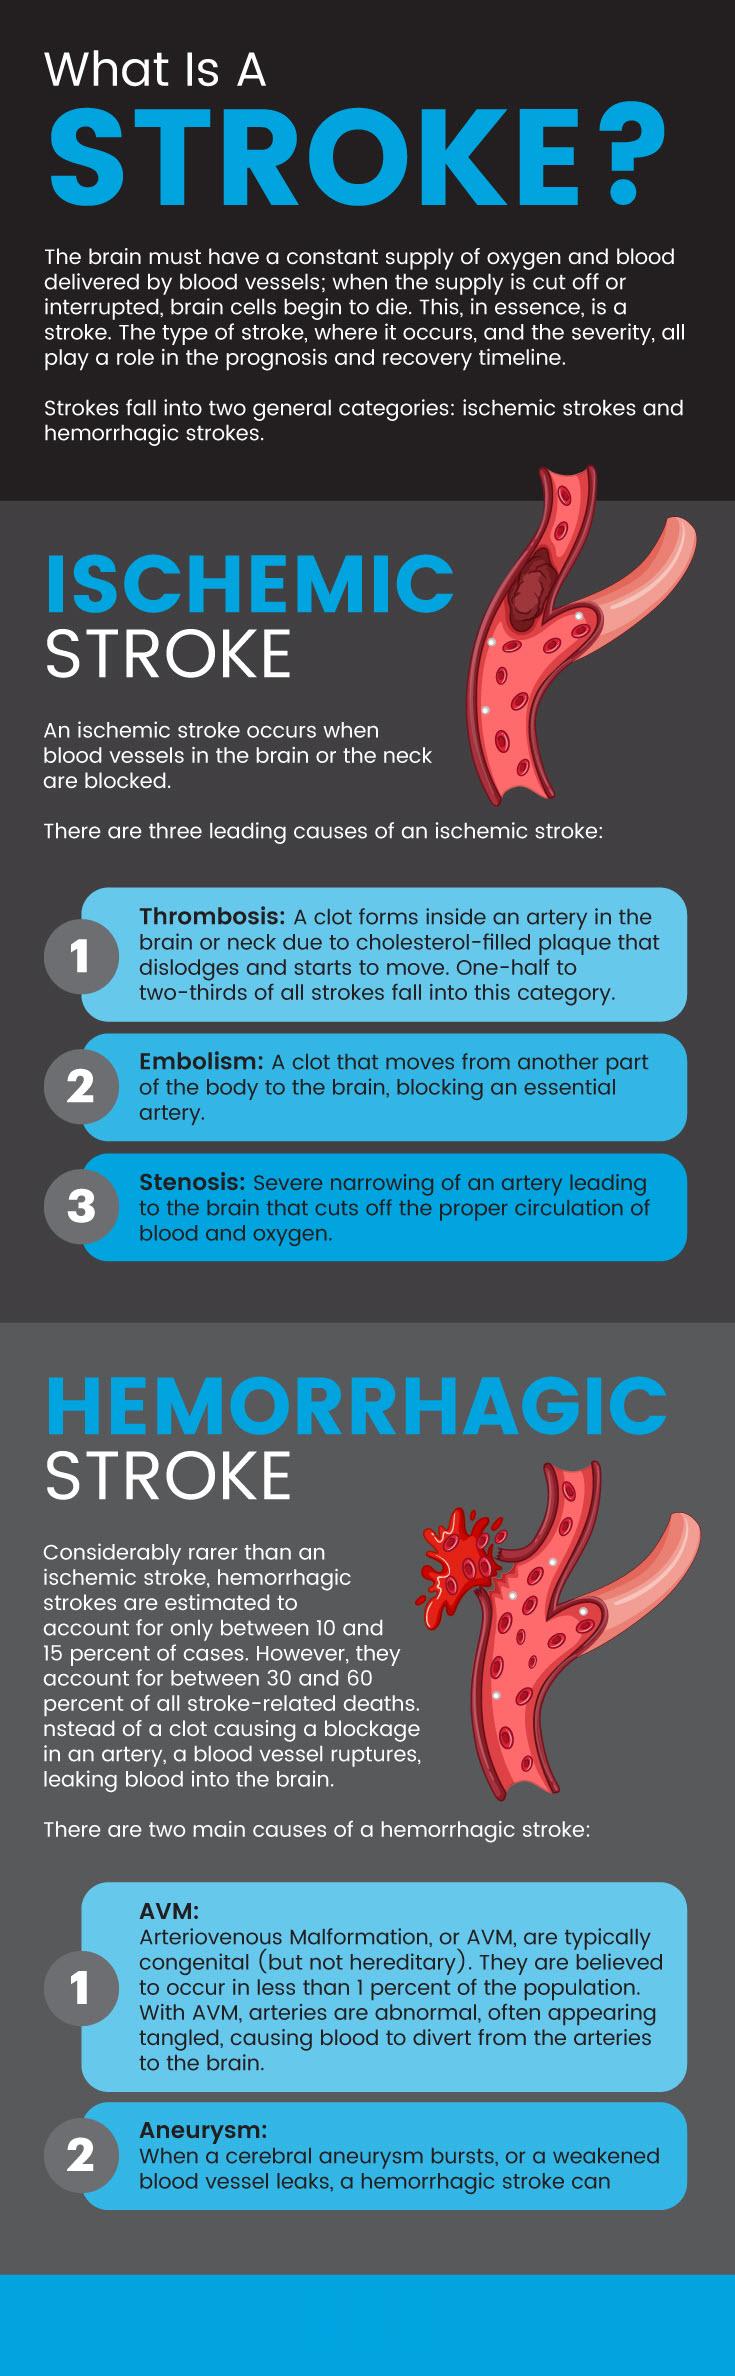 What is a stroke?: warning signs of a stroke - MKexpress.net